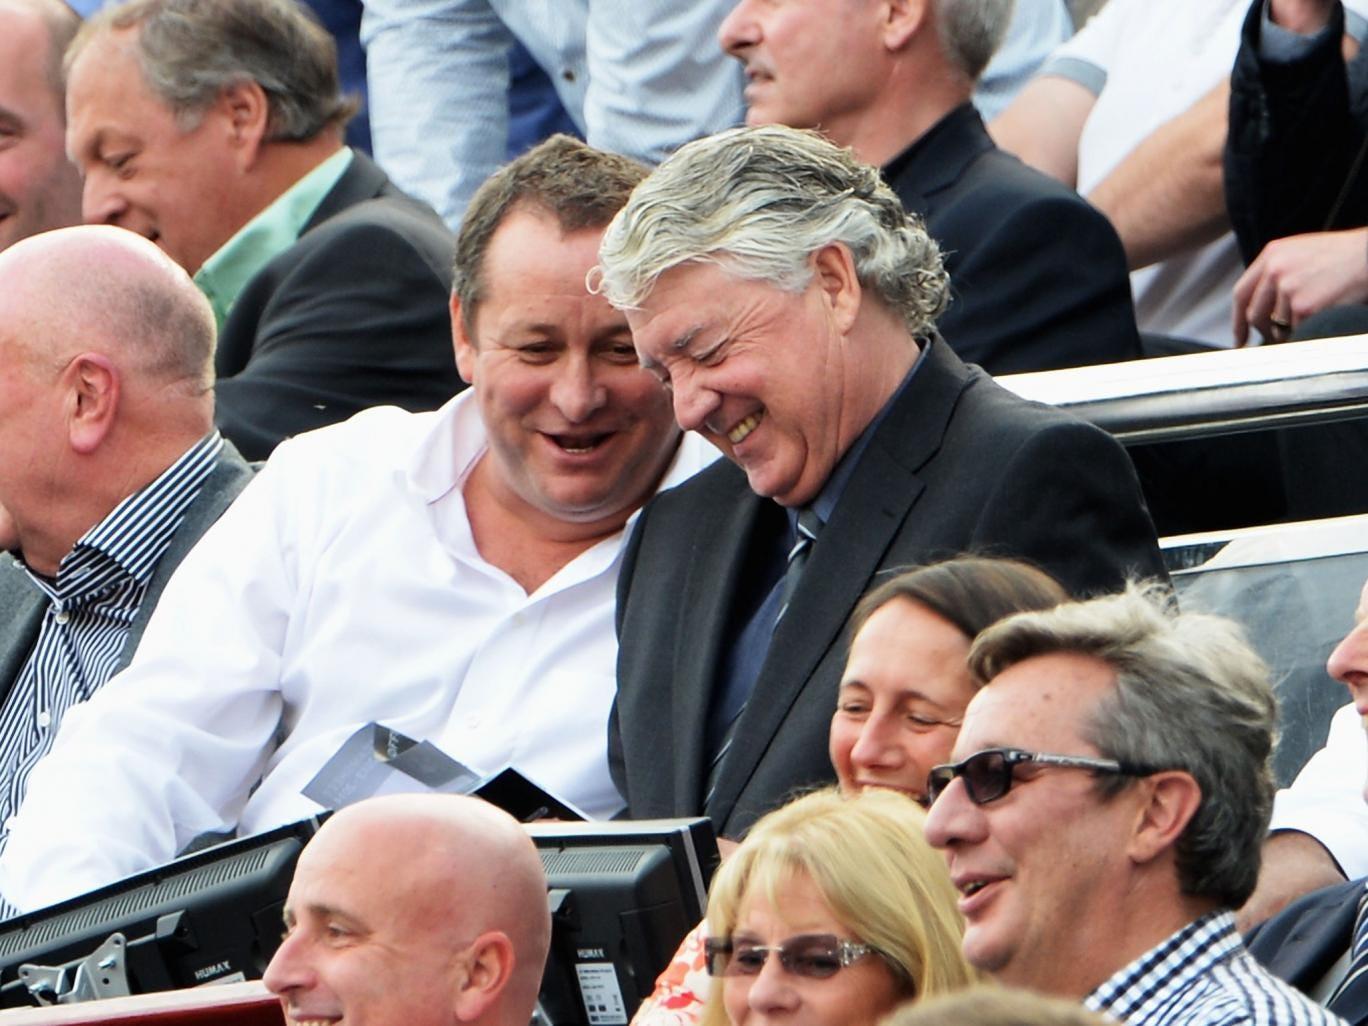 Mike Ashley and Joe Kinnear enjoy their seats at the heart of St James's Park